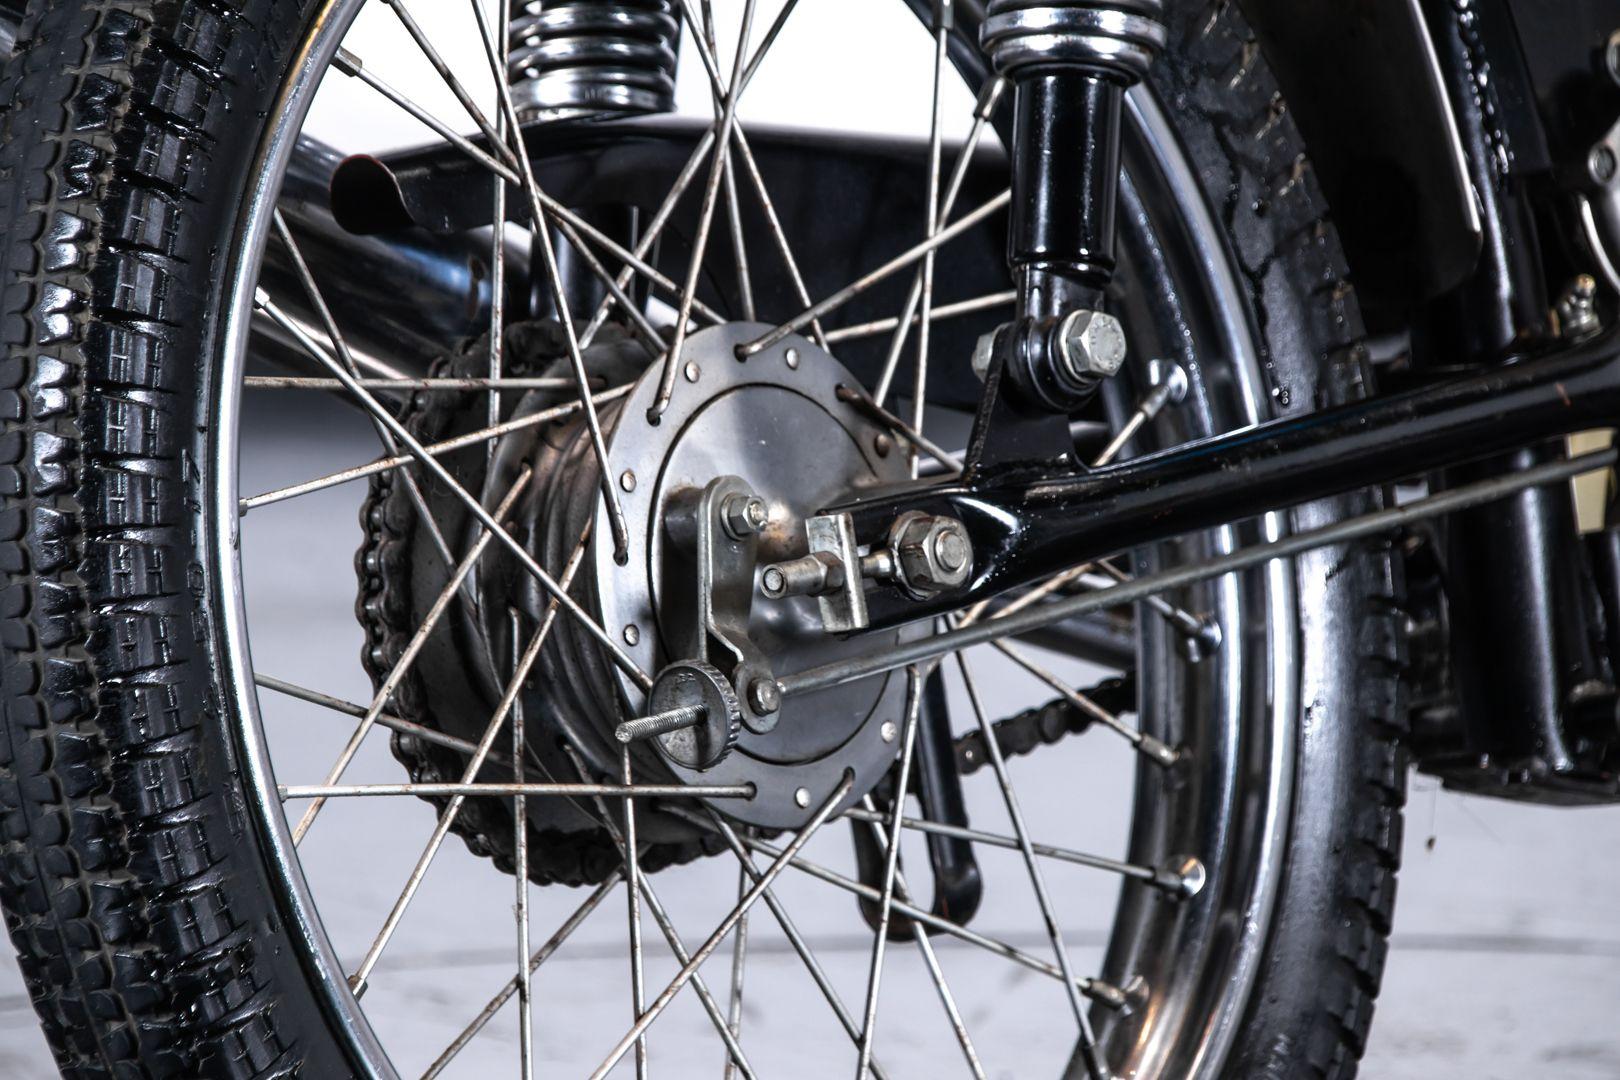 1973 Moto Morini Corsarino ZT Super Scrambler 77673